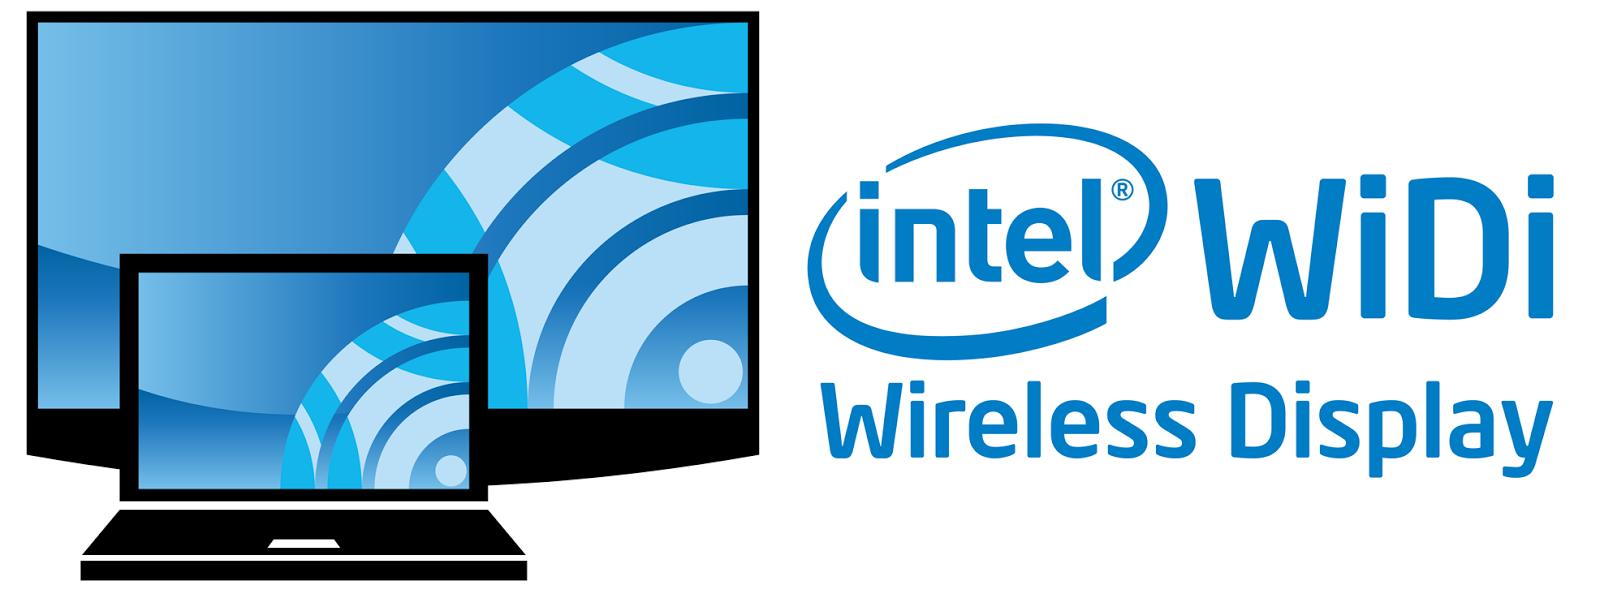 Intel Widi Windows 7 Lg Tv - ninjasoup